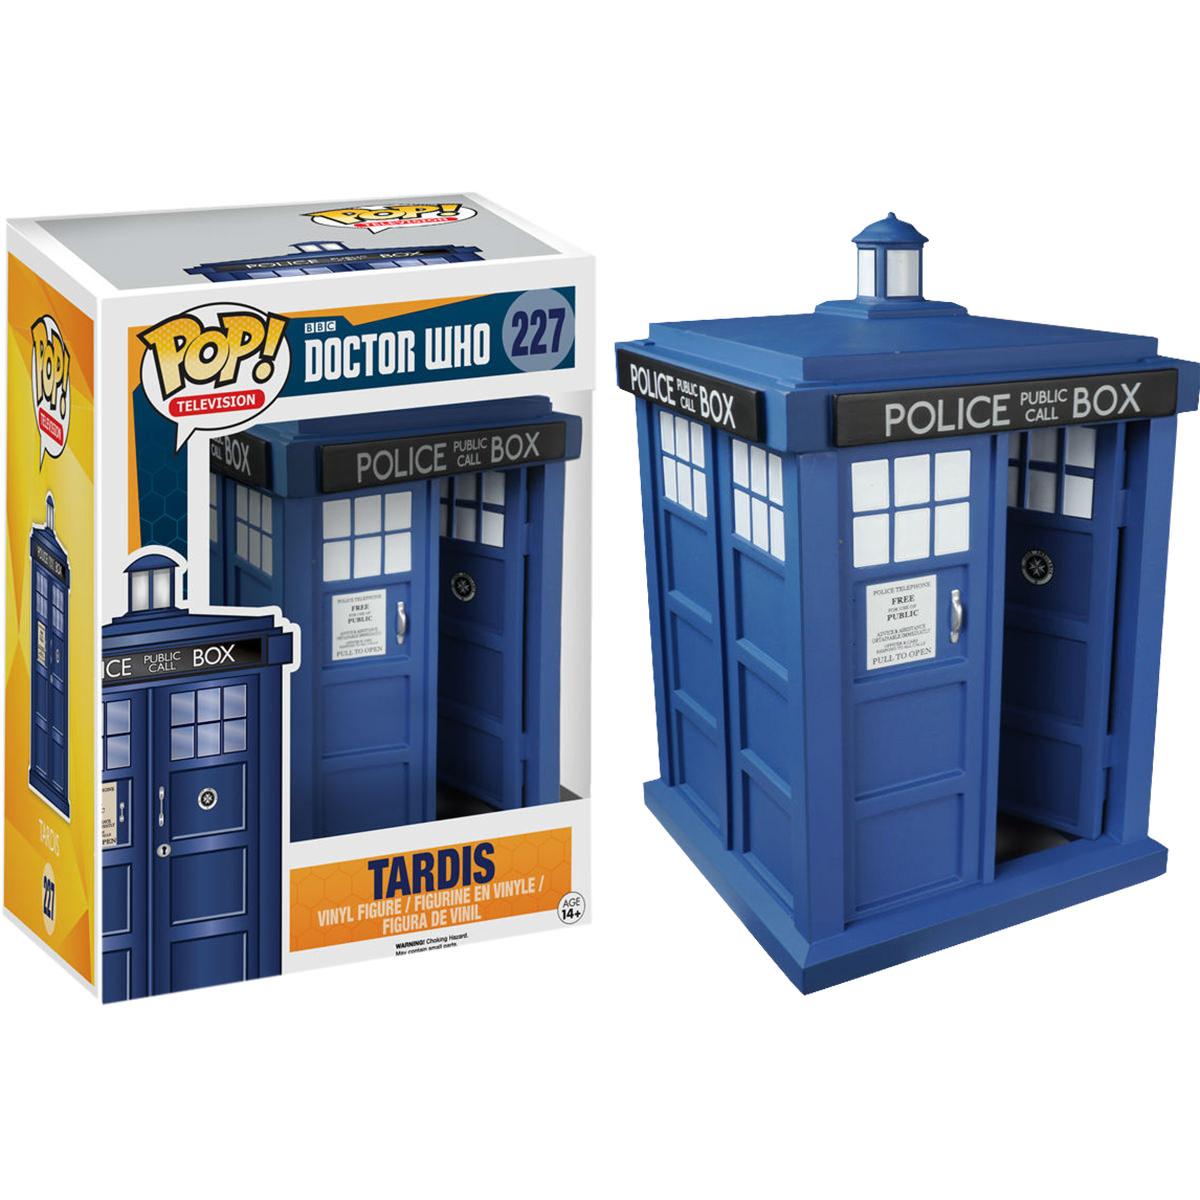 Funko Doctor Who Tardis Pop Vinyl Figure At Hobby Warehouse